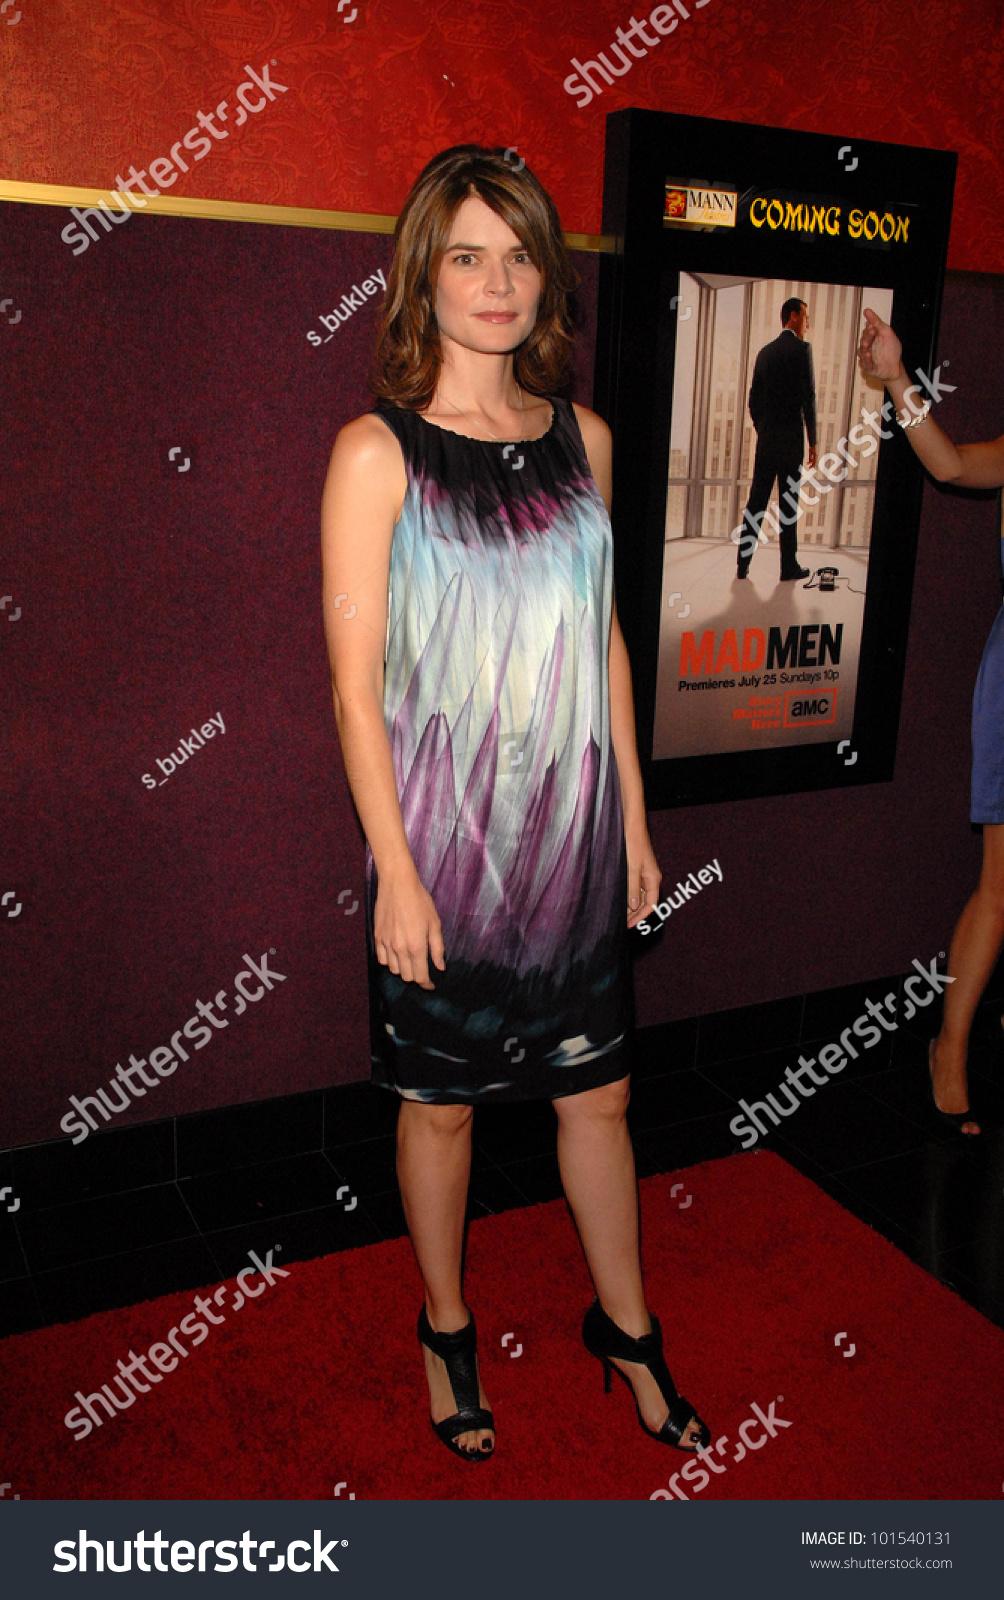 Kelle Kerr,Alycia Delmore Hot gallery Kathleen Lockhart,Laura Spencer (actress)